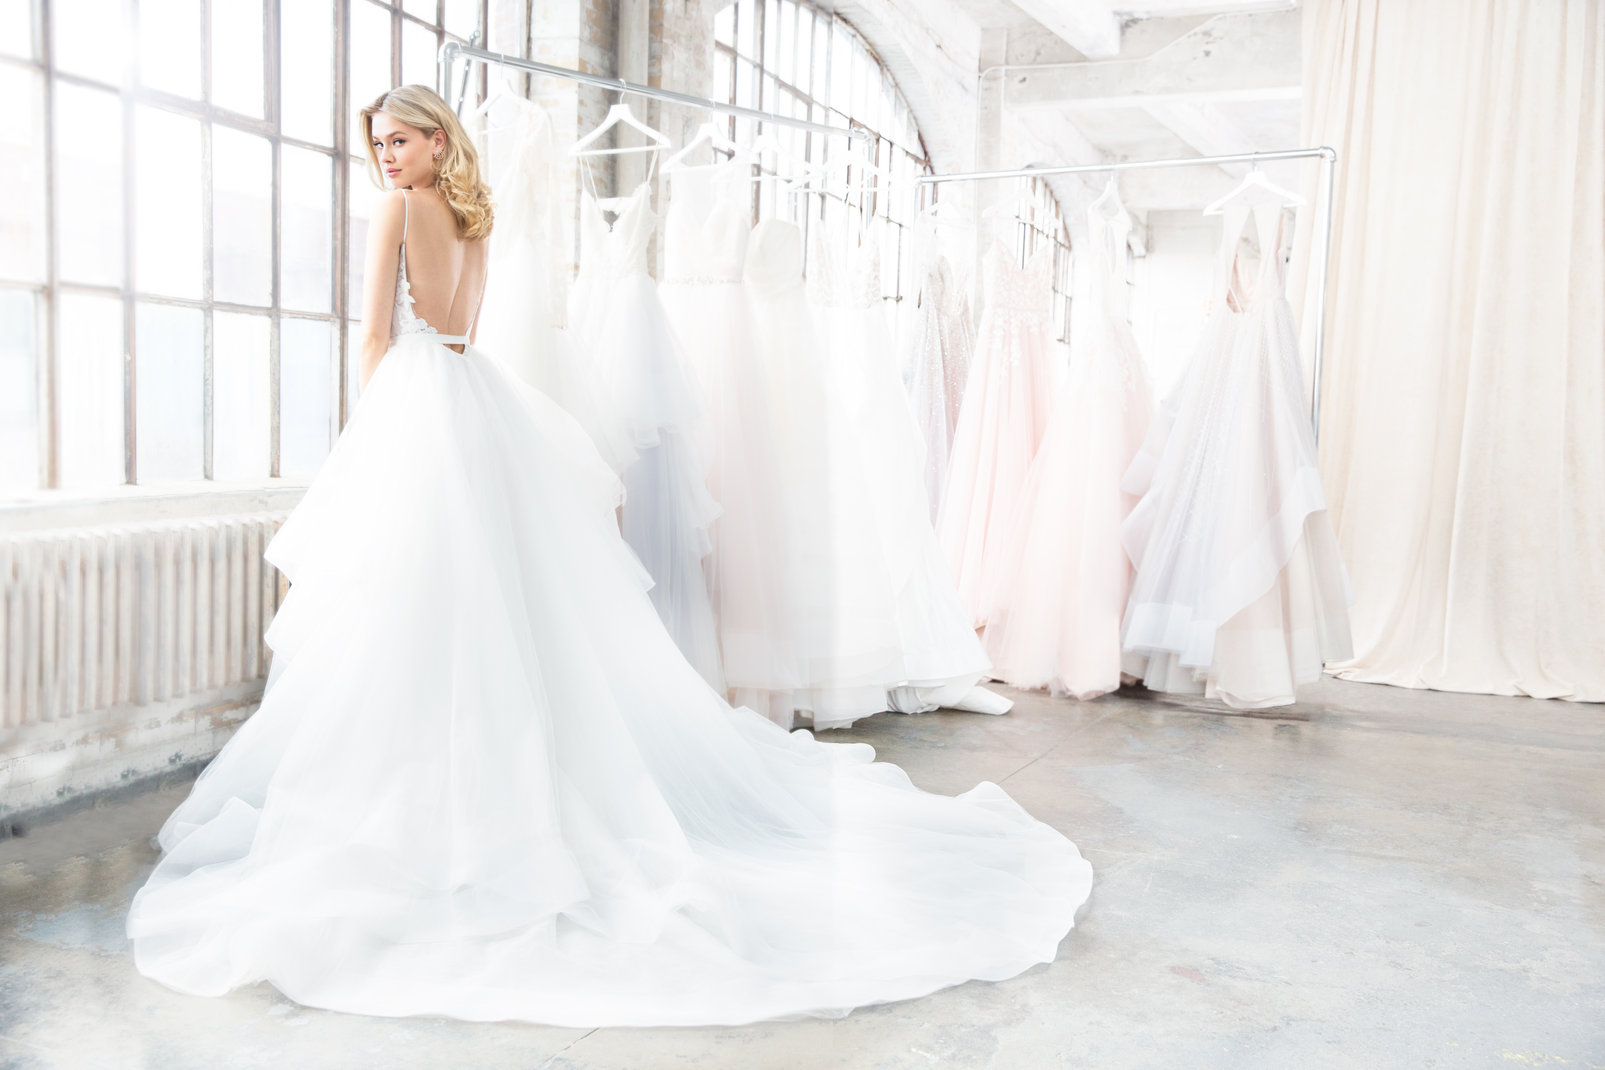 blush-hayley-paige-bridal-spring-2018-style-1807-nessy_8.jpg